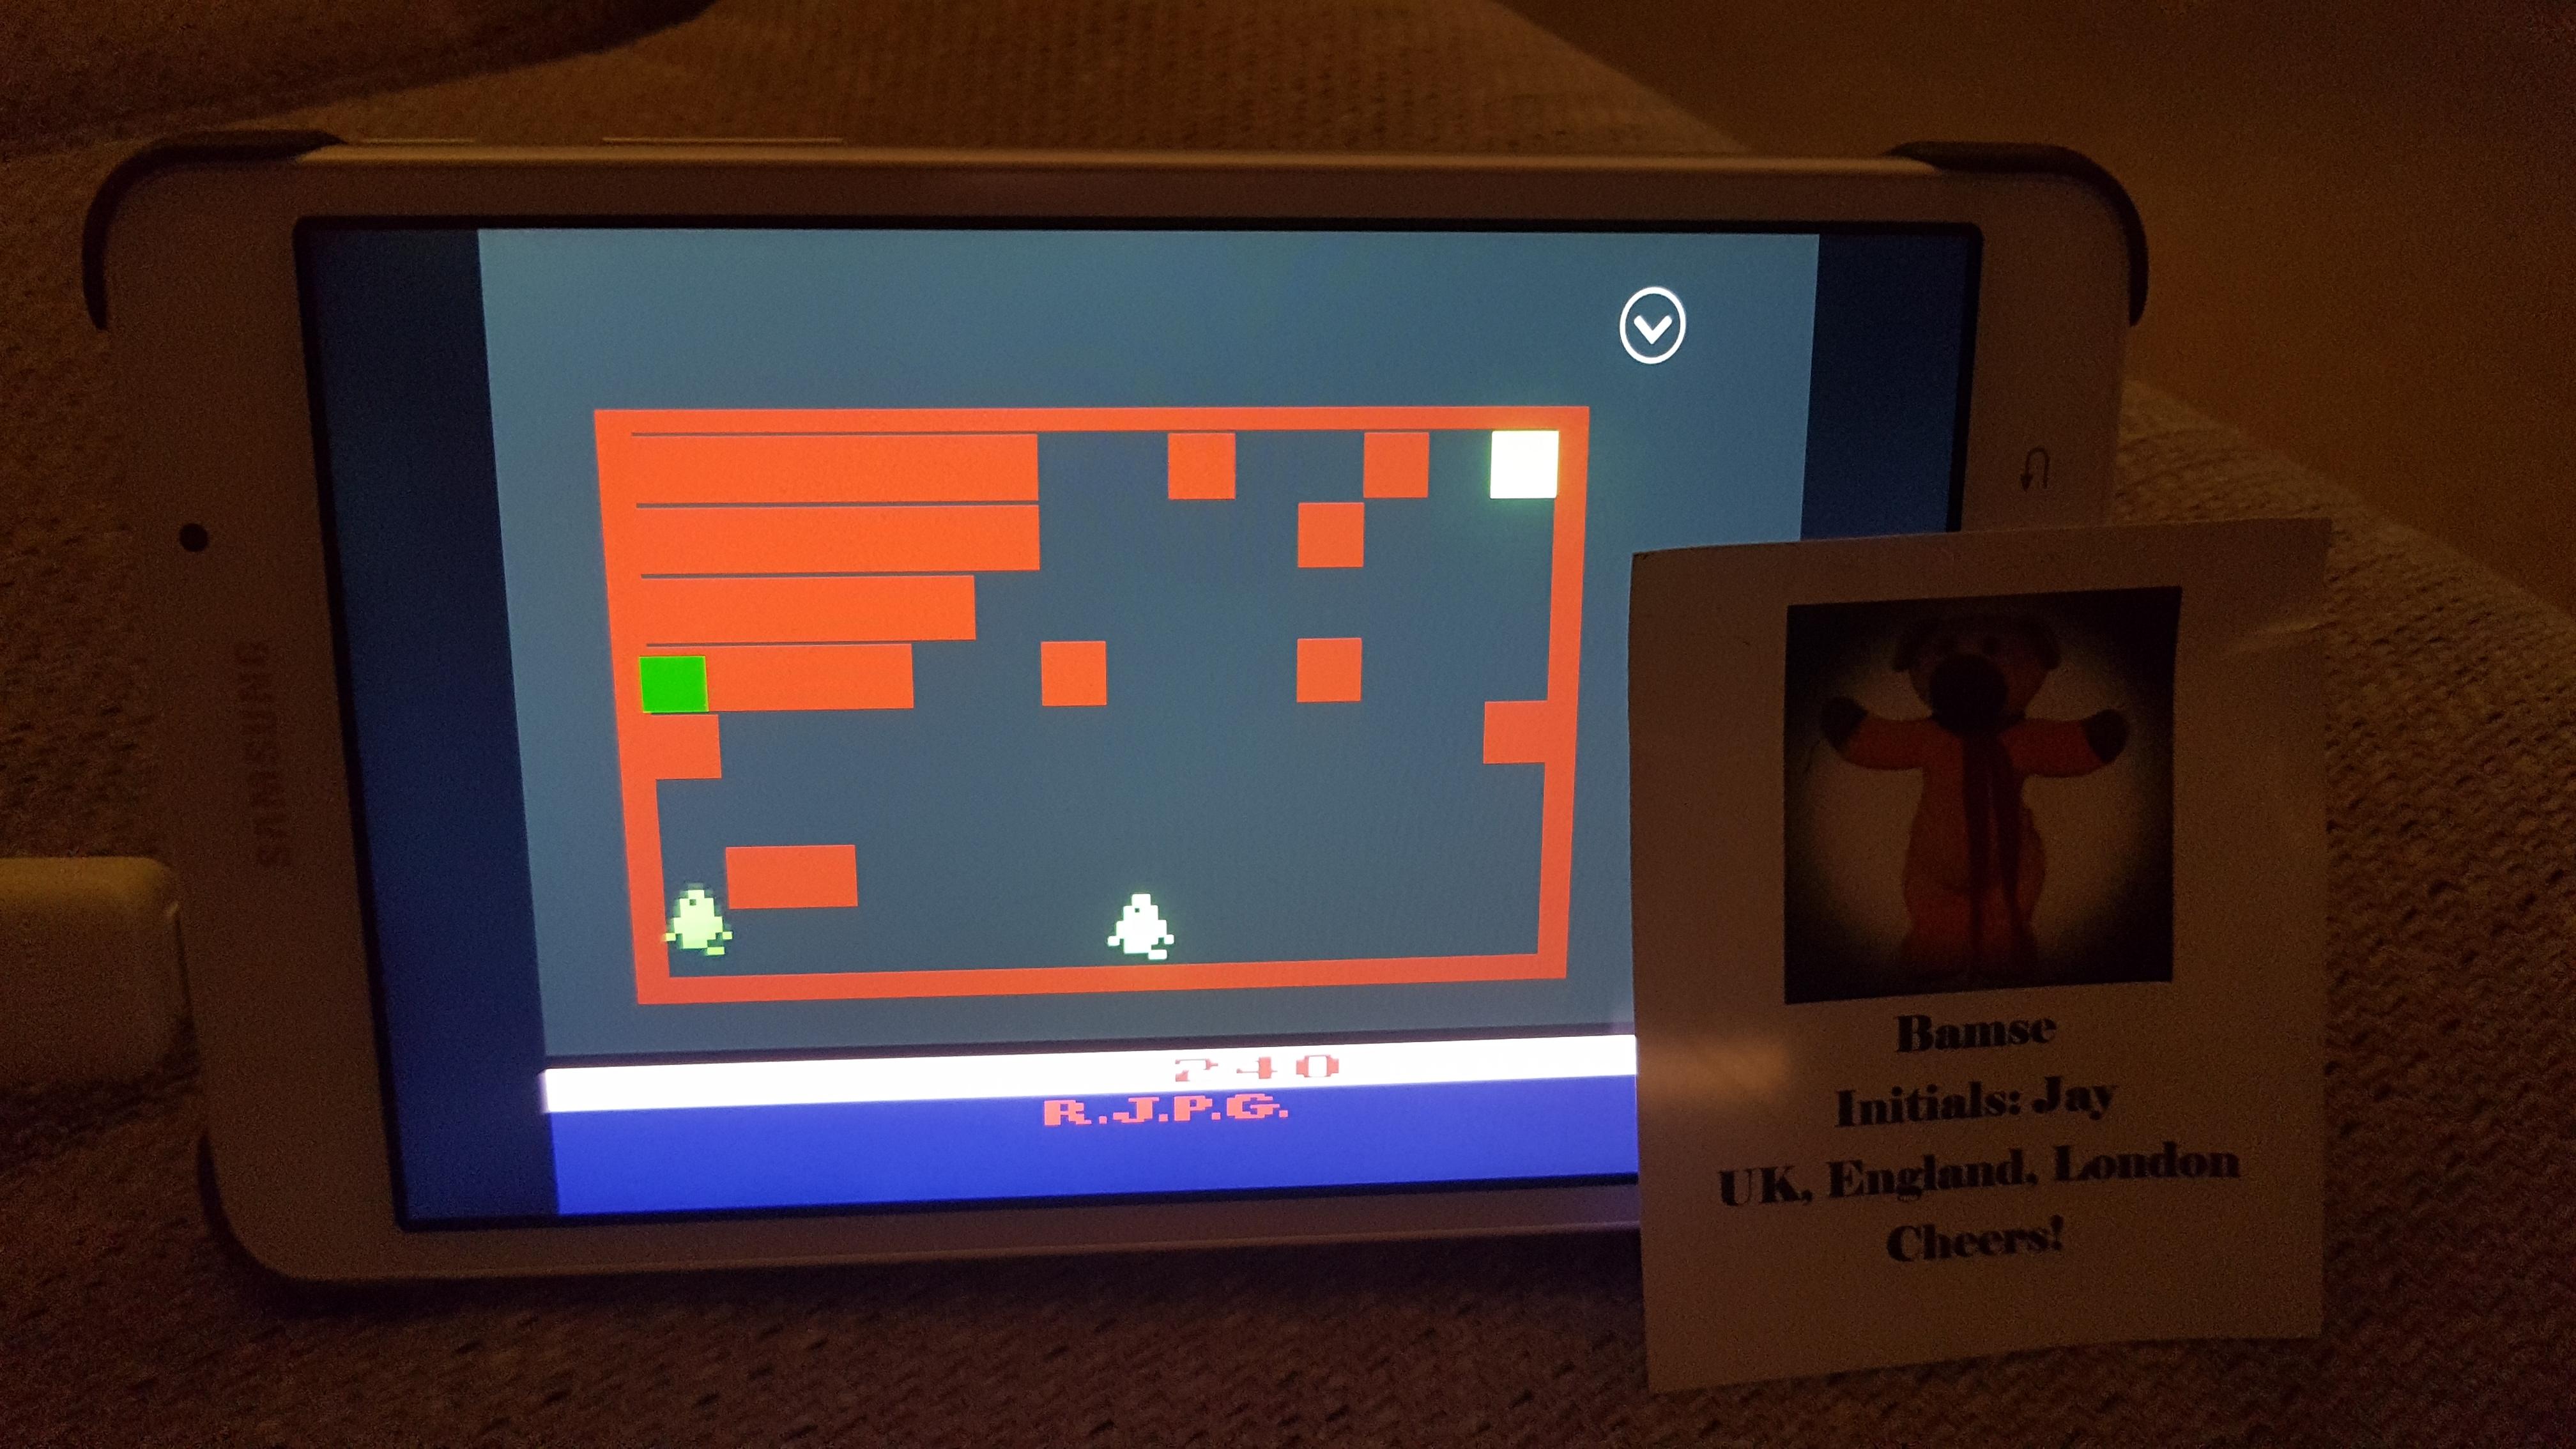 Bamse: Frisco (Atari 2600 Emulated) 240 points on 2019-07-02 18:33:51